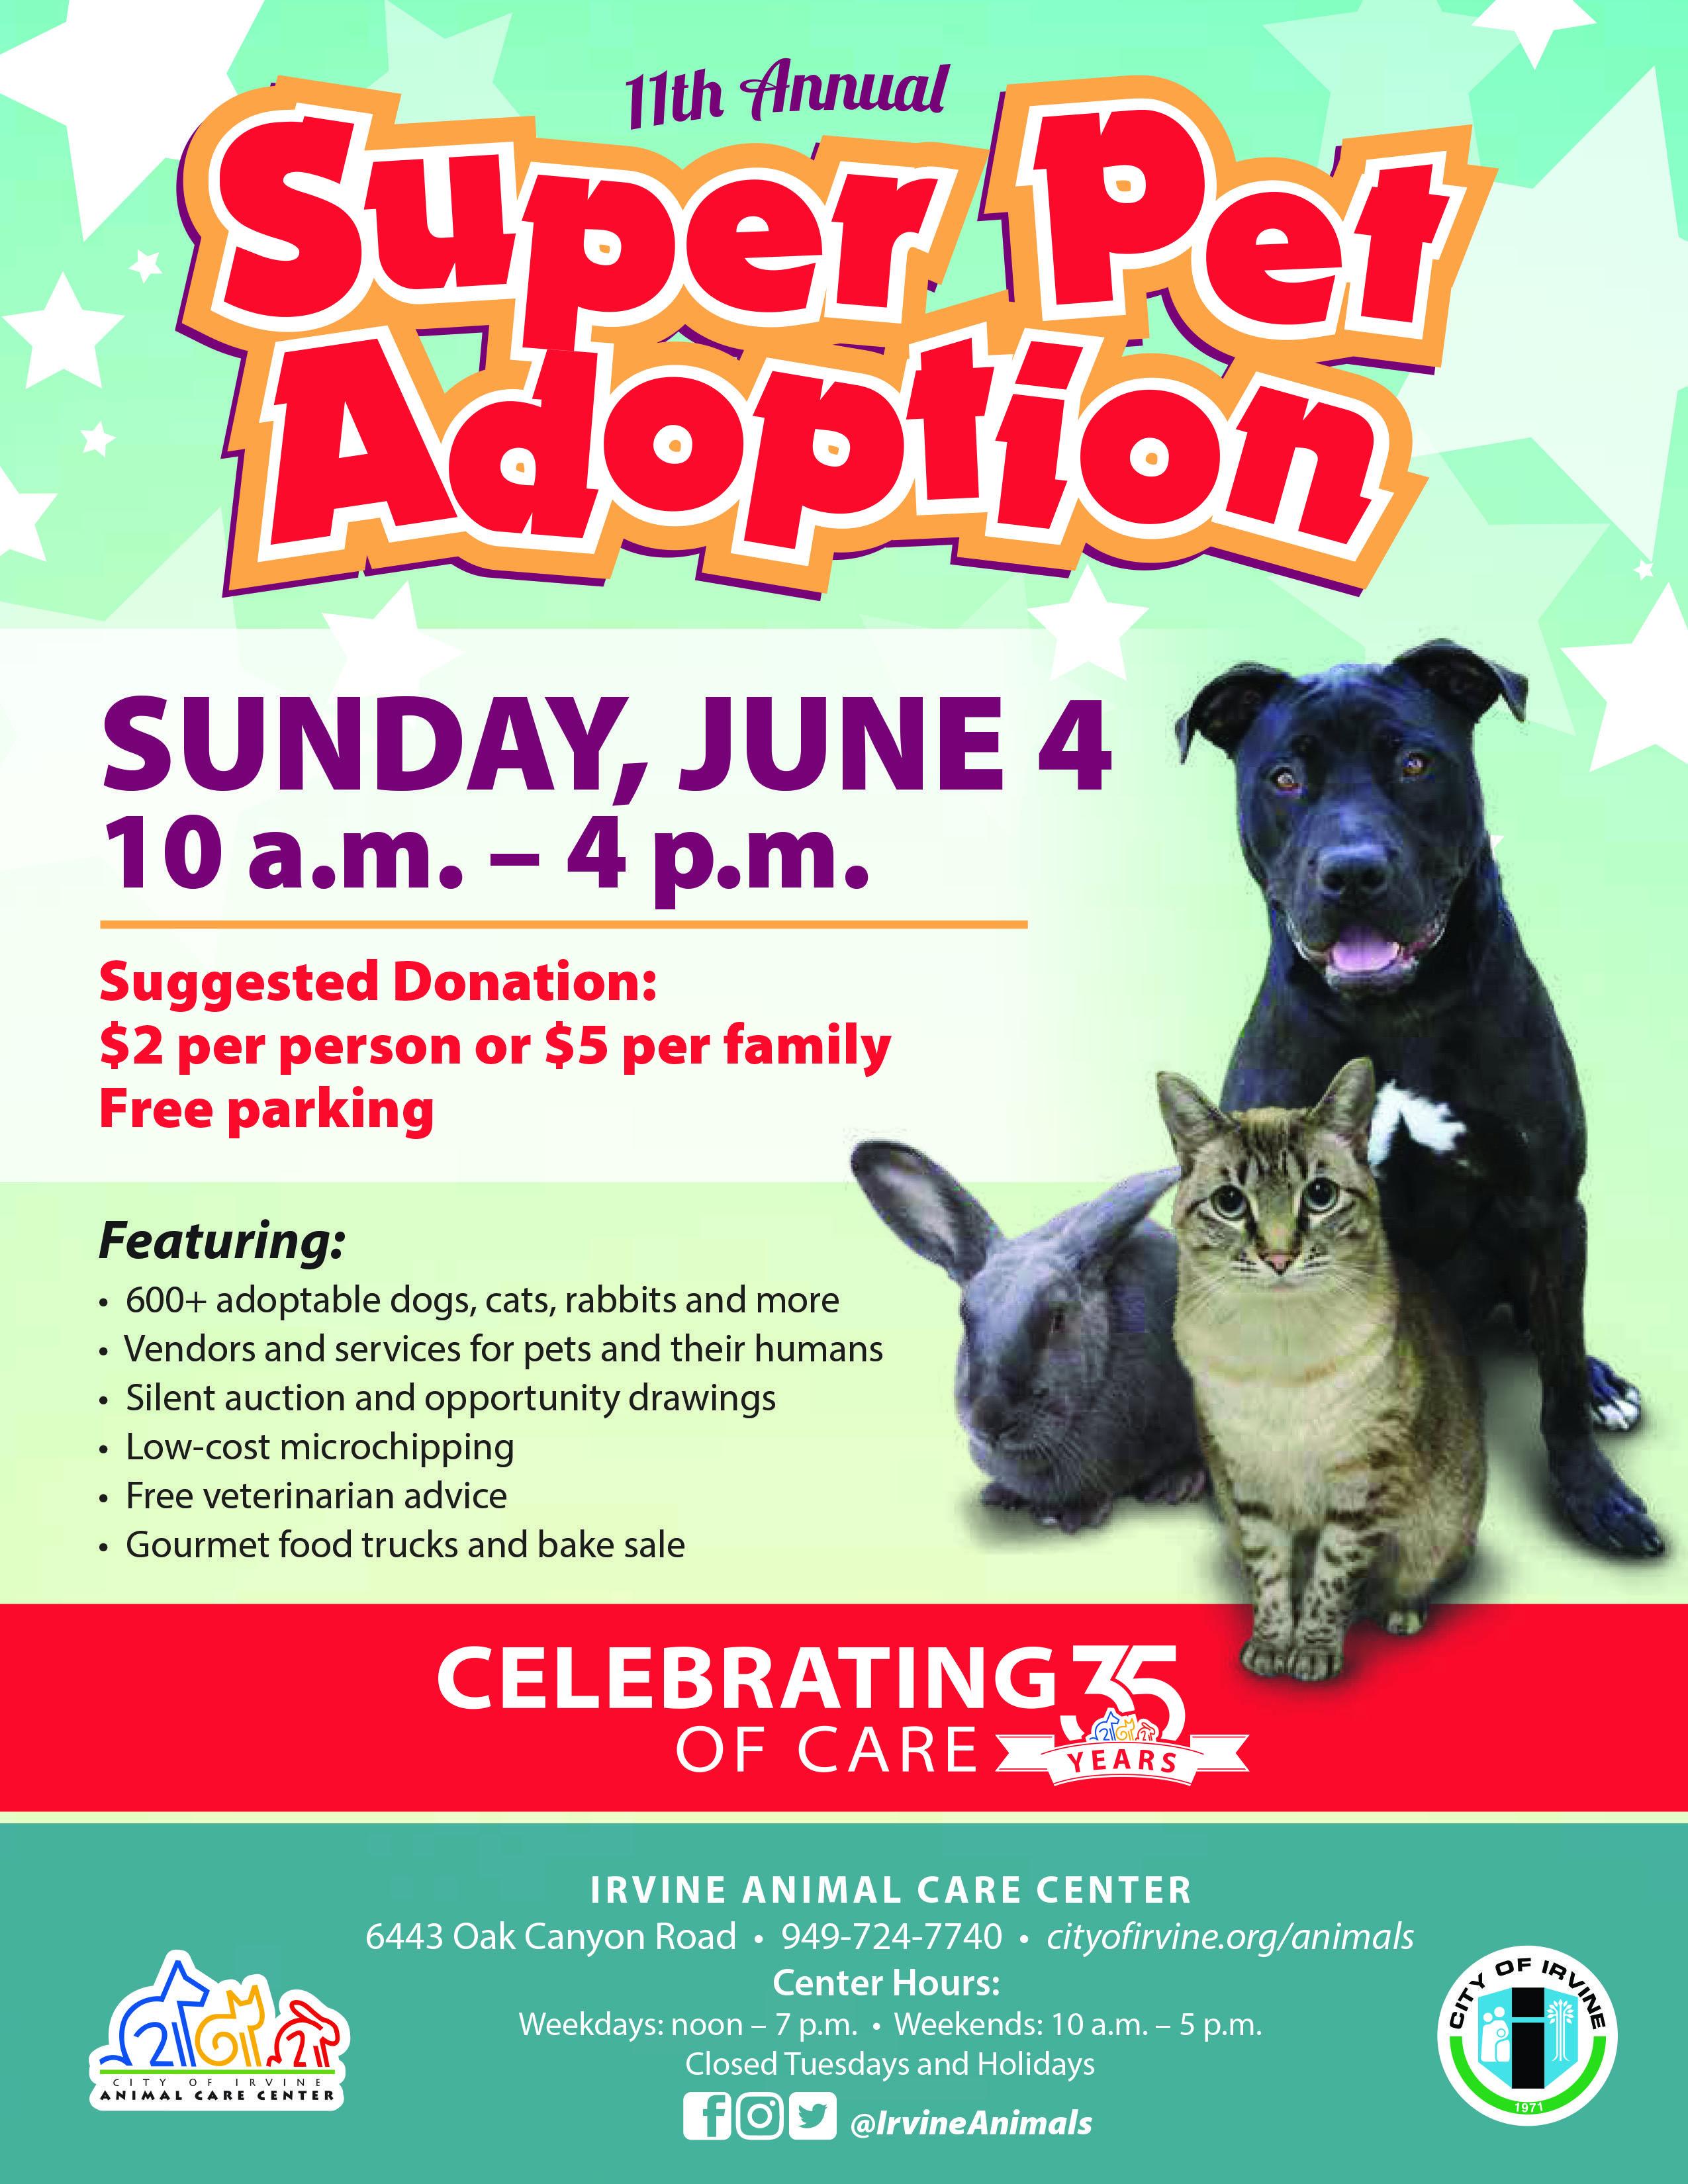 Super Pet Adoption (With images) Pet adoption event, Pet